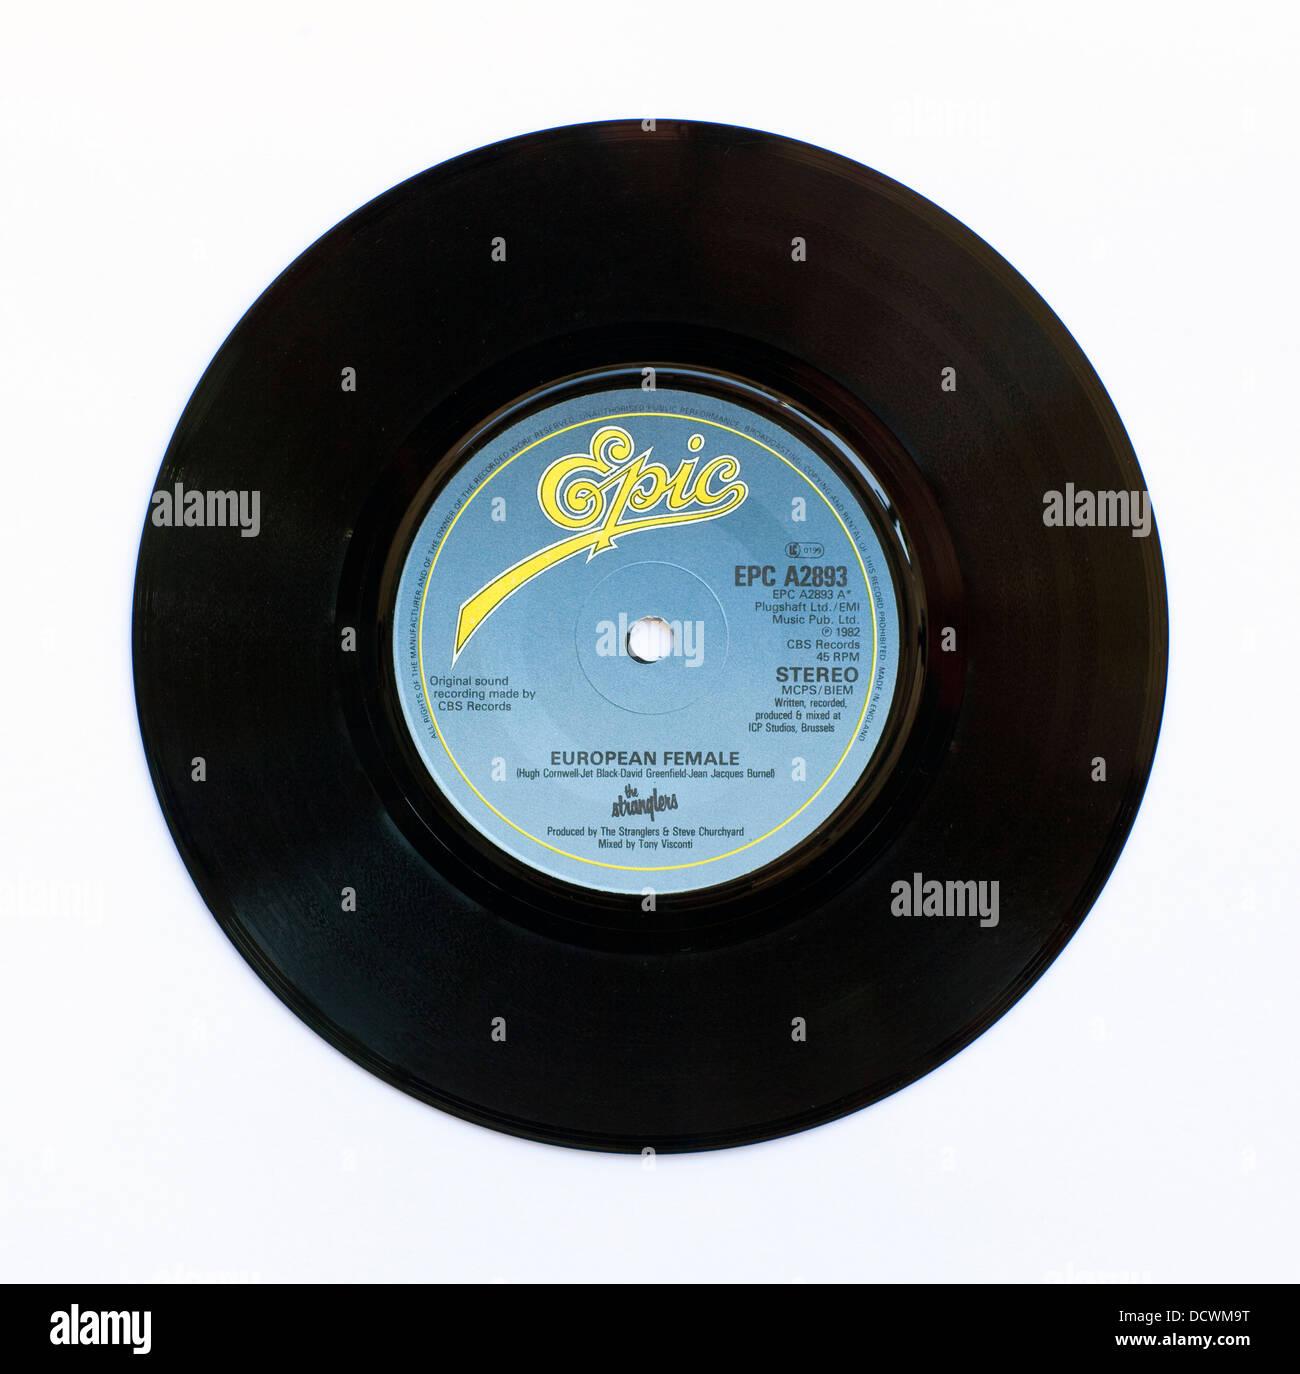 The Stranglers - European Female, 1982 7' single on Epic - Stock Image